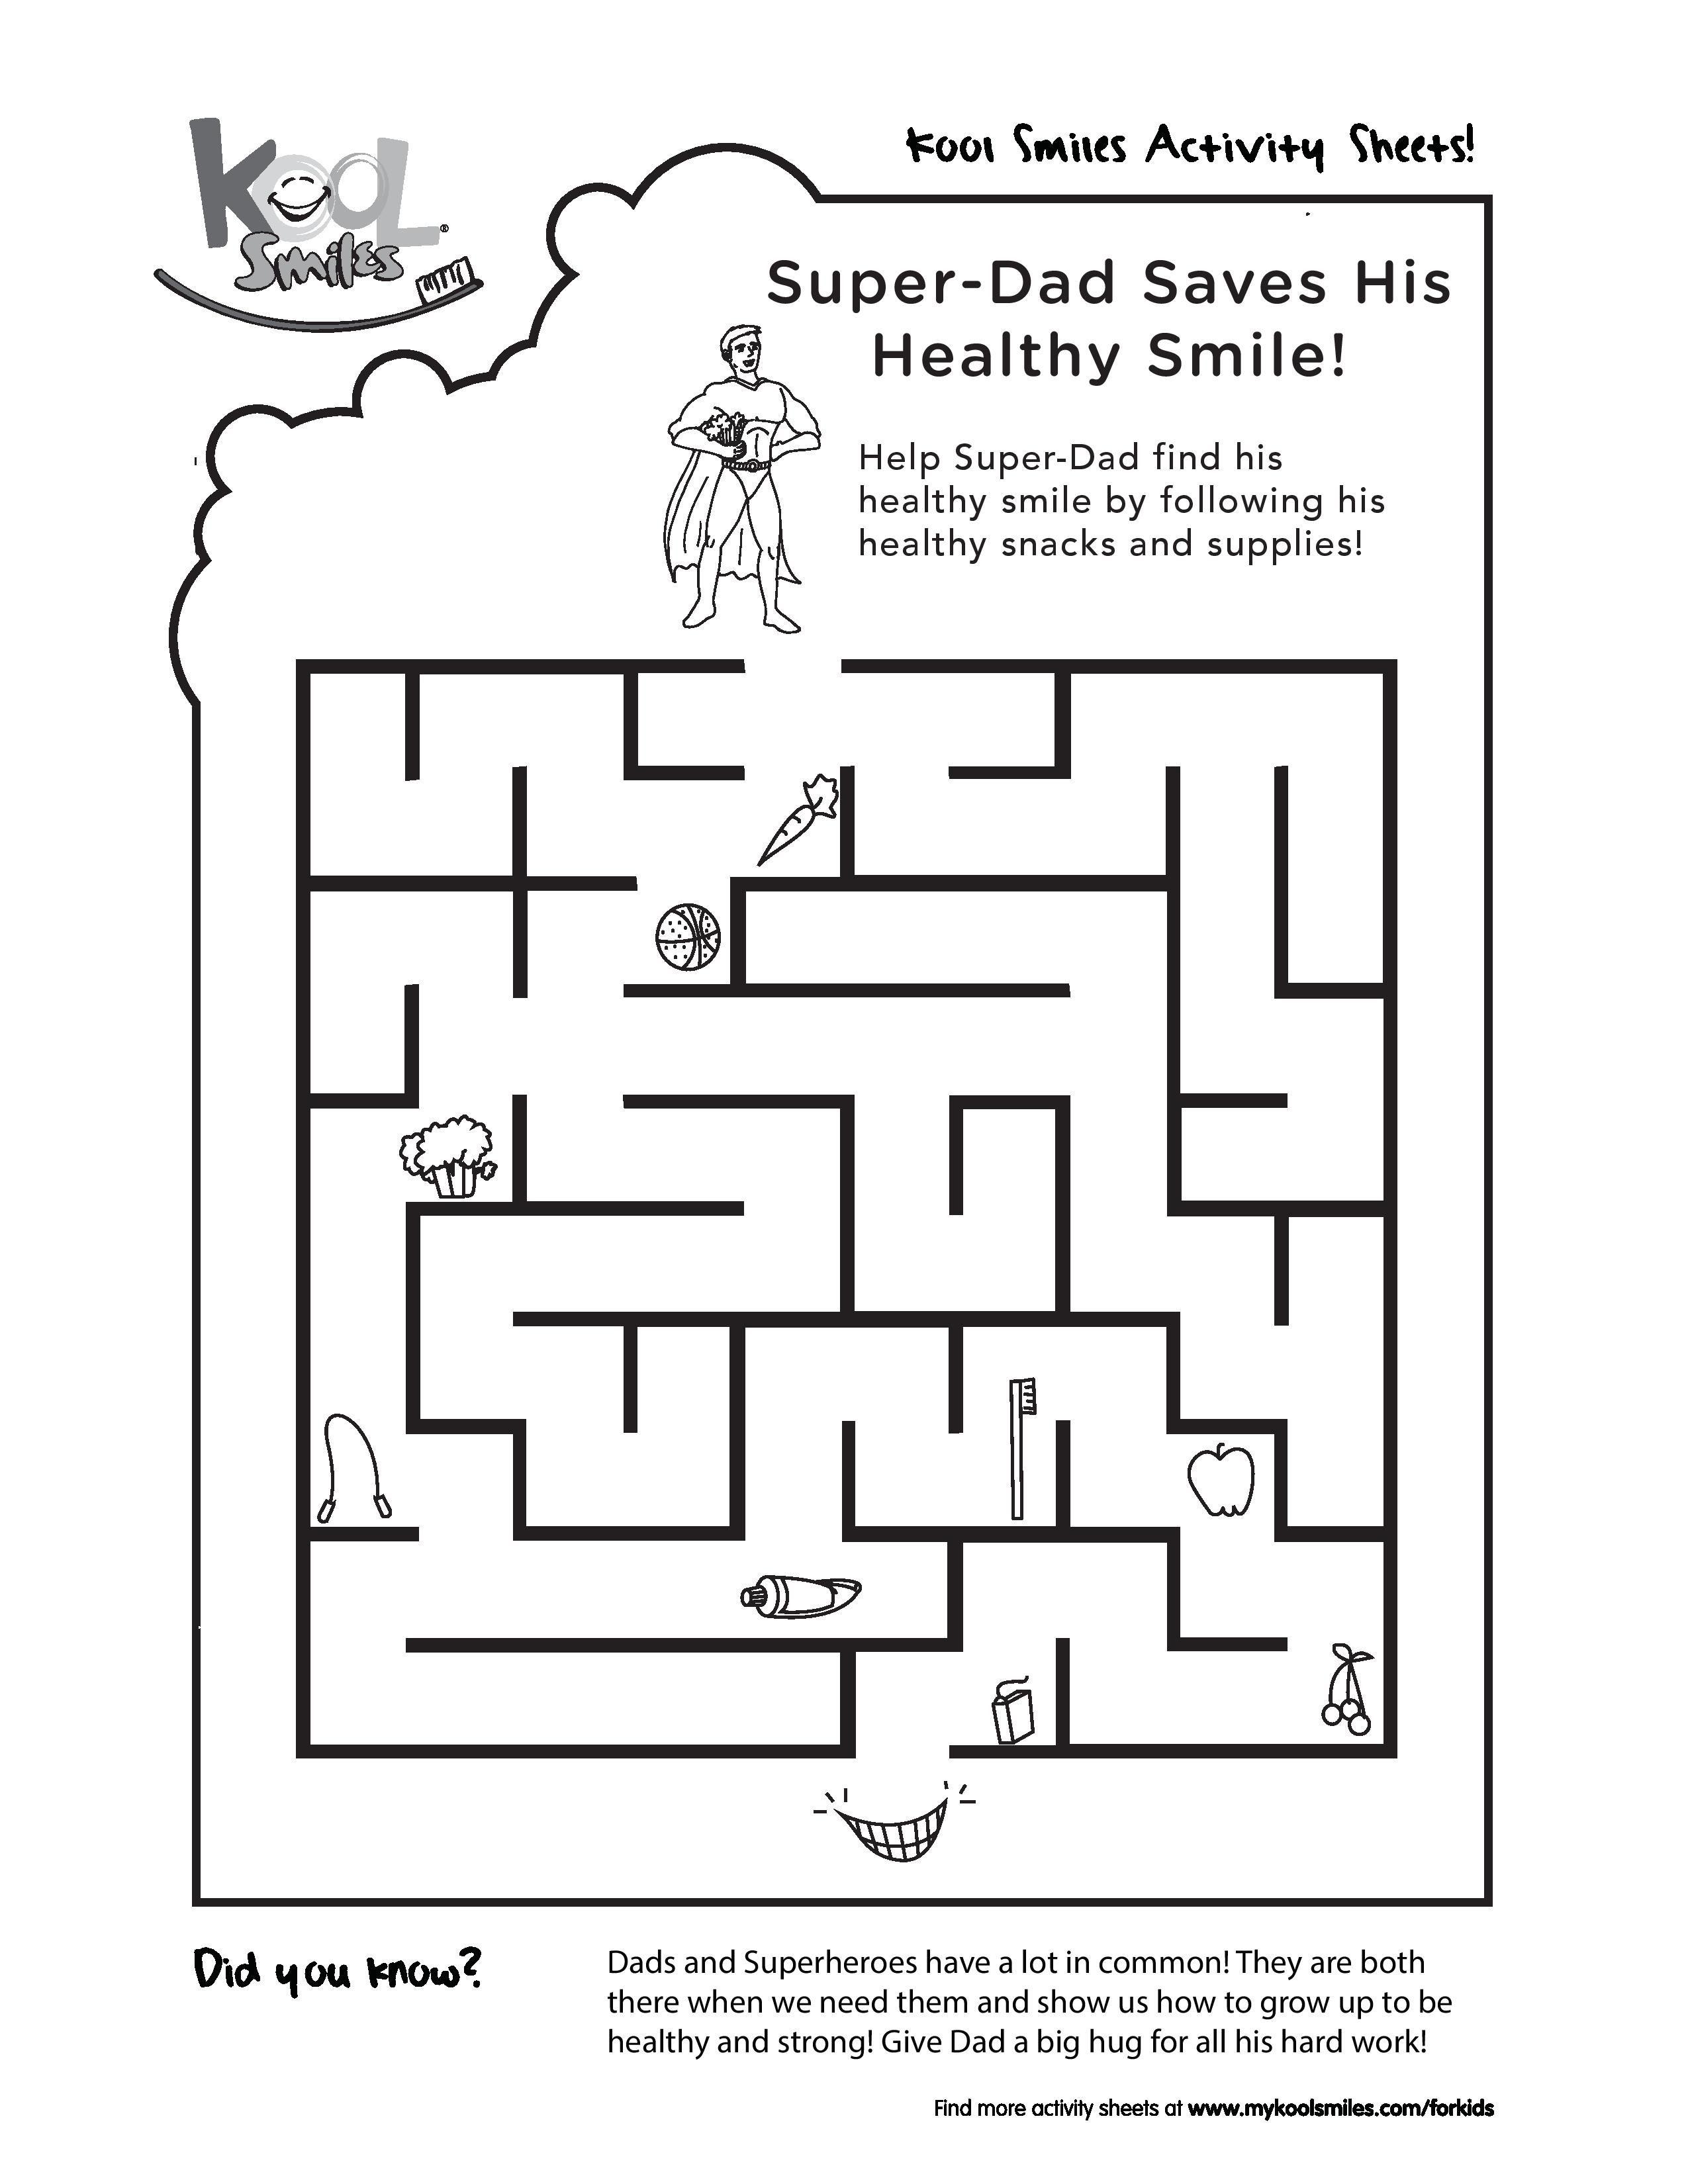 help super dad find his healthy smile - Kids Fun Activity Sheets